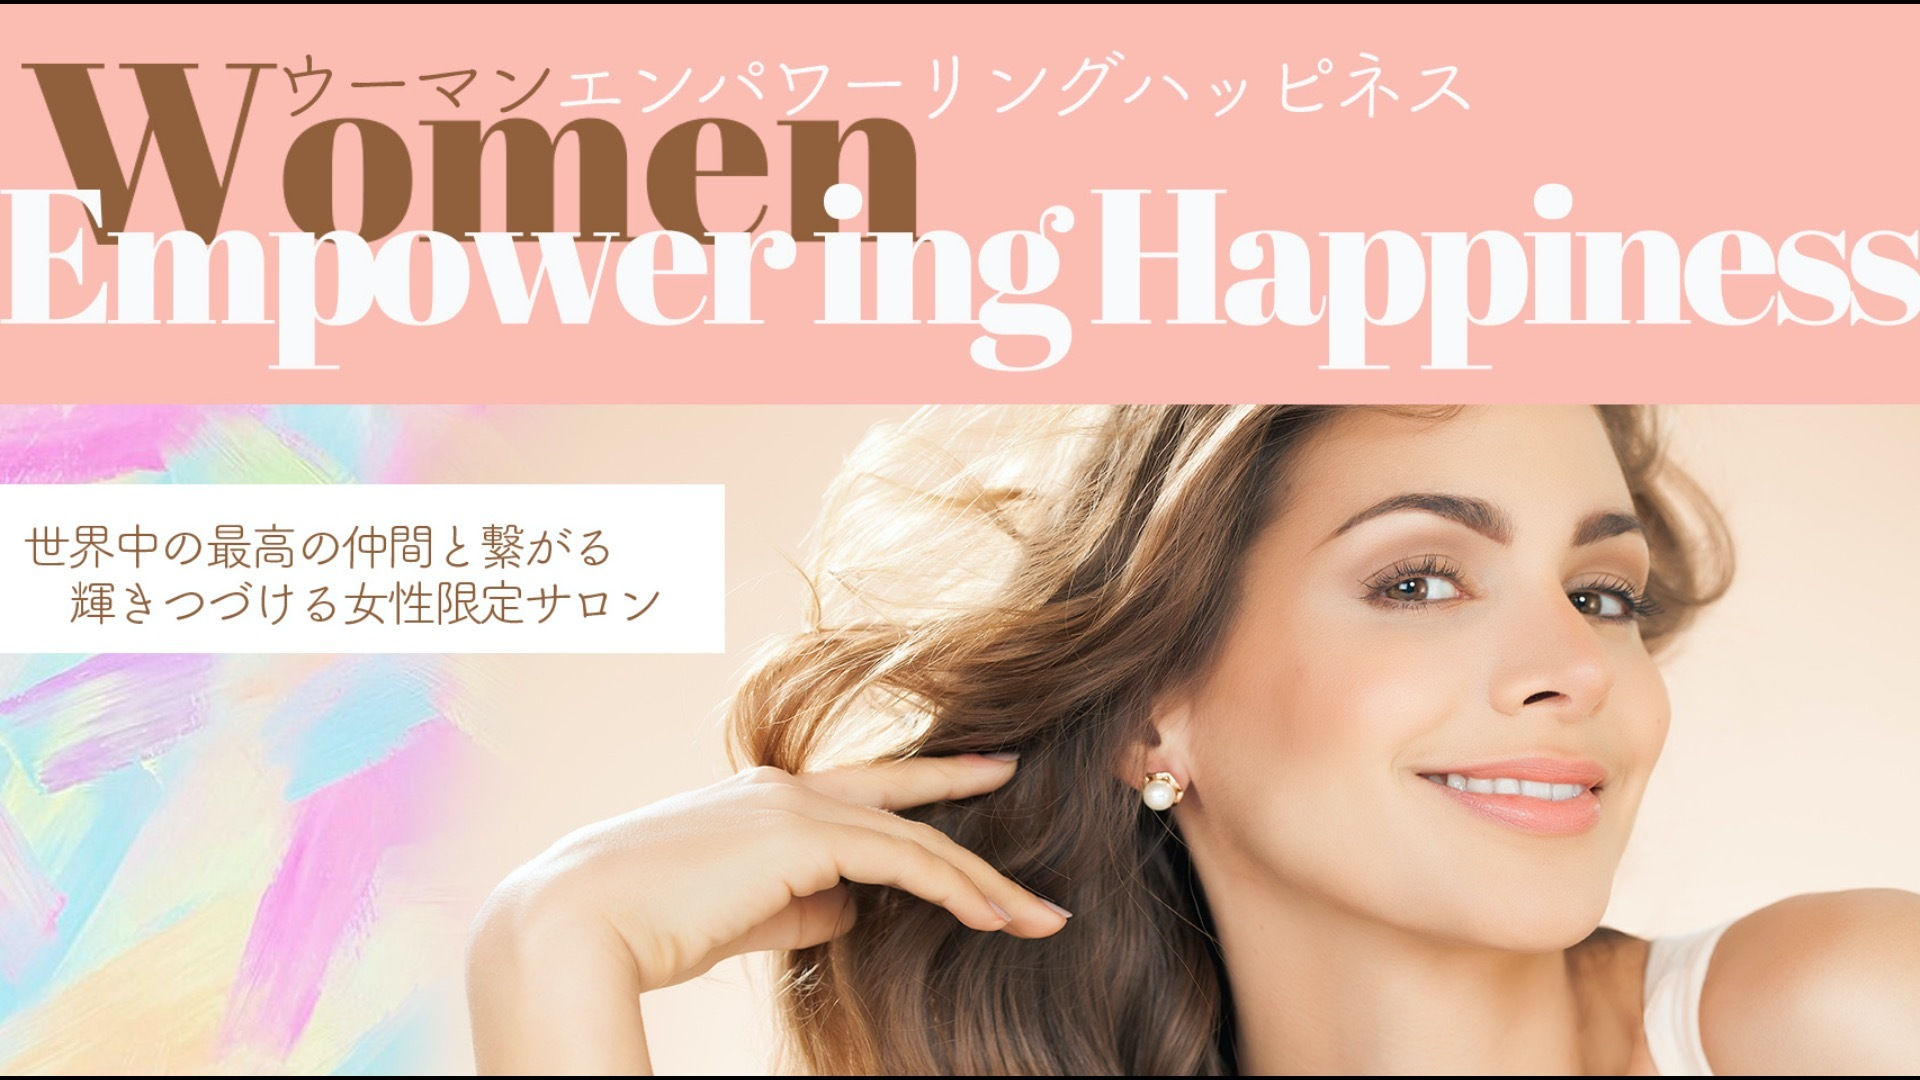 Women Empowering Happiness